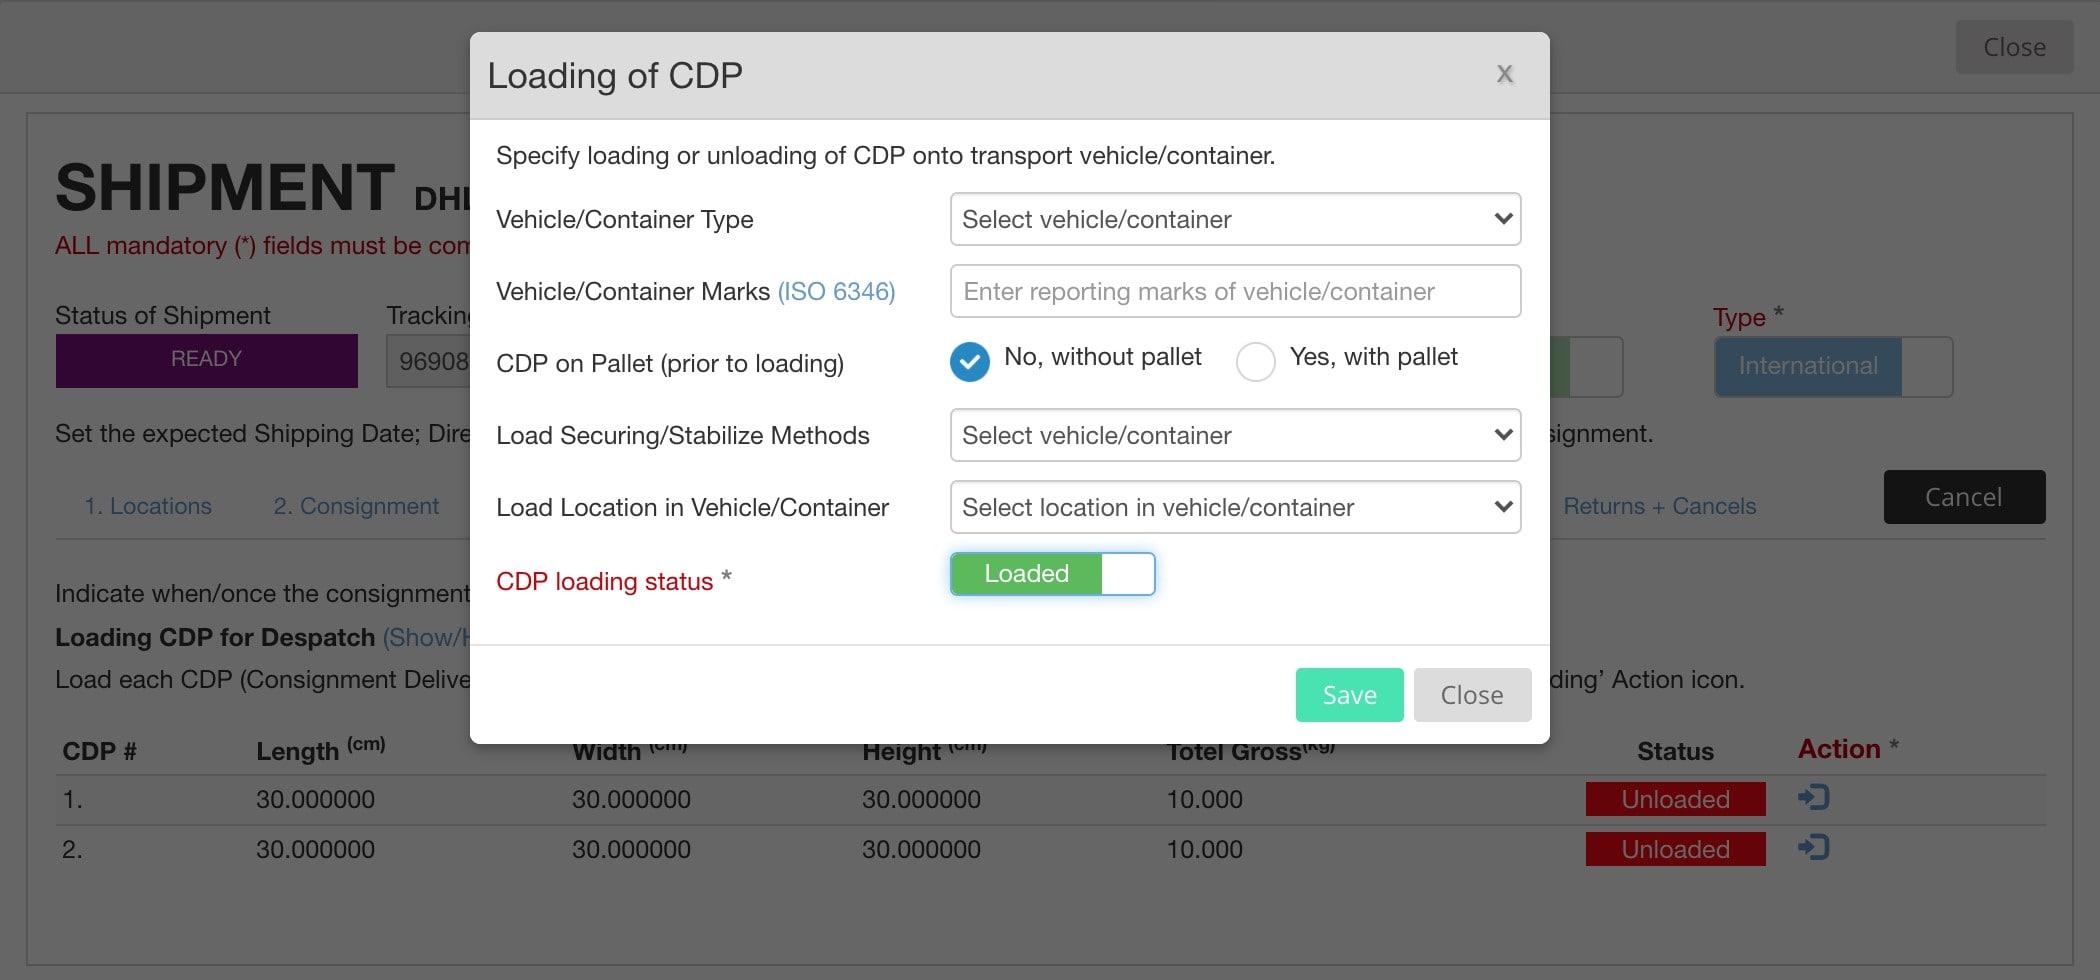 shipment-loading-cdp